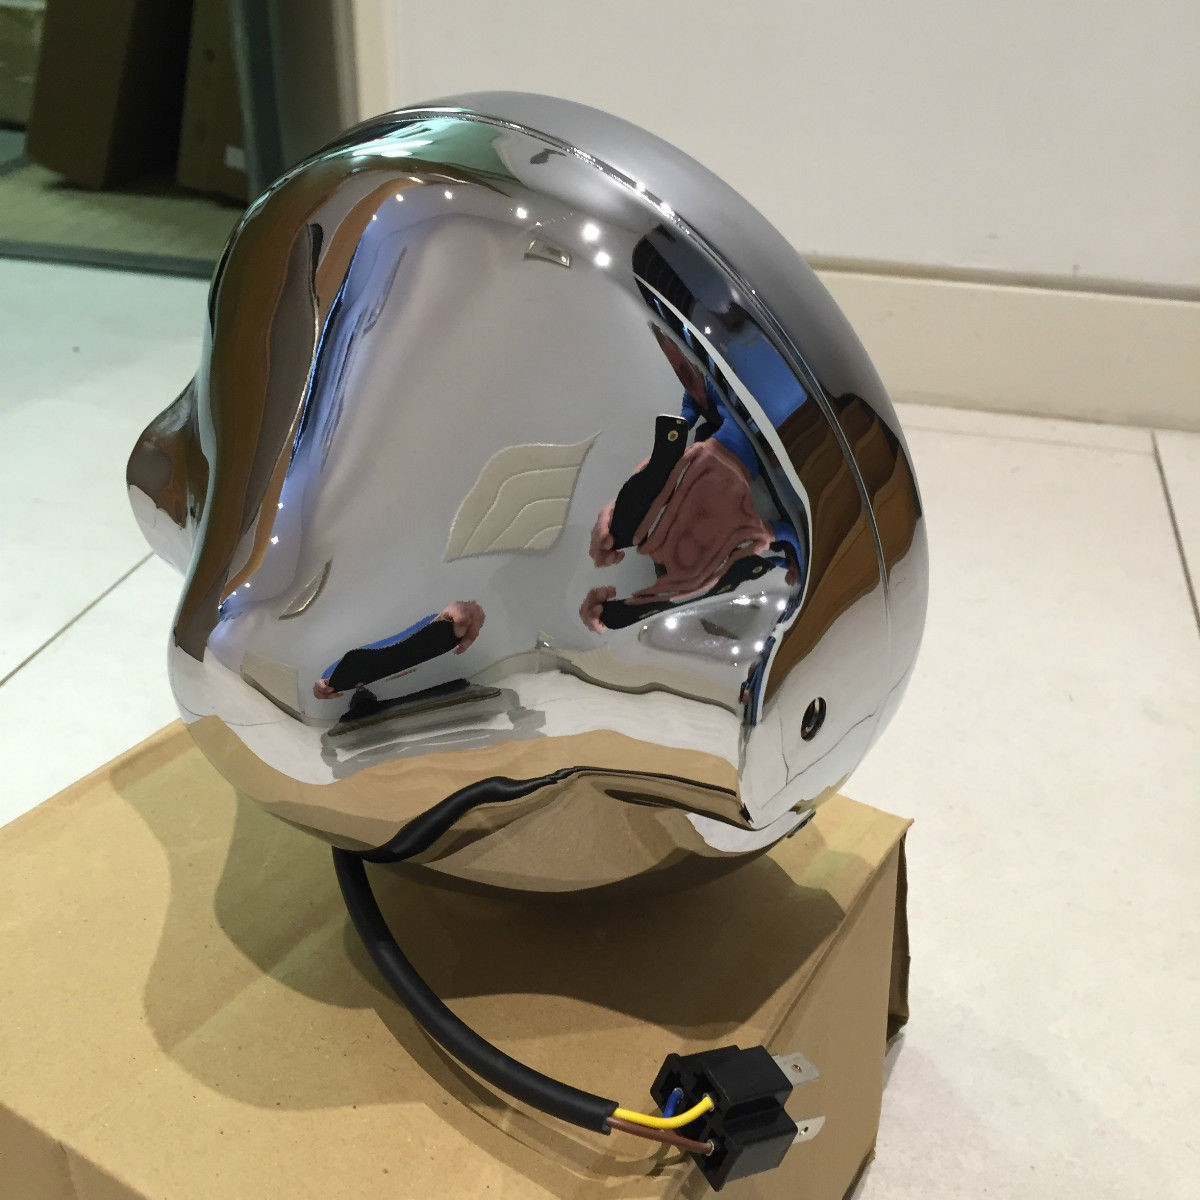 Cafe Racer Headlight Assembly : Motorcycle cafe racer headlight assembly casing for all